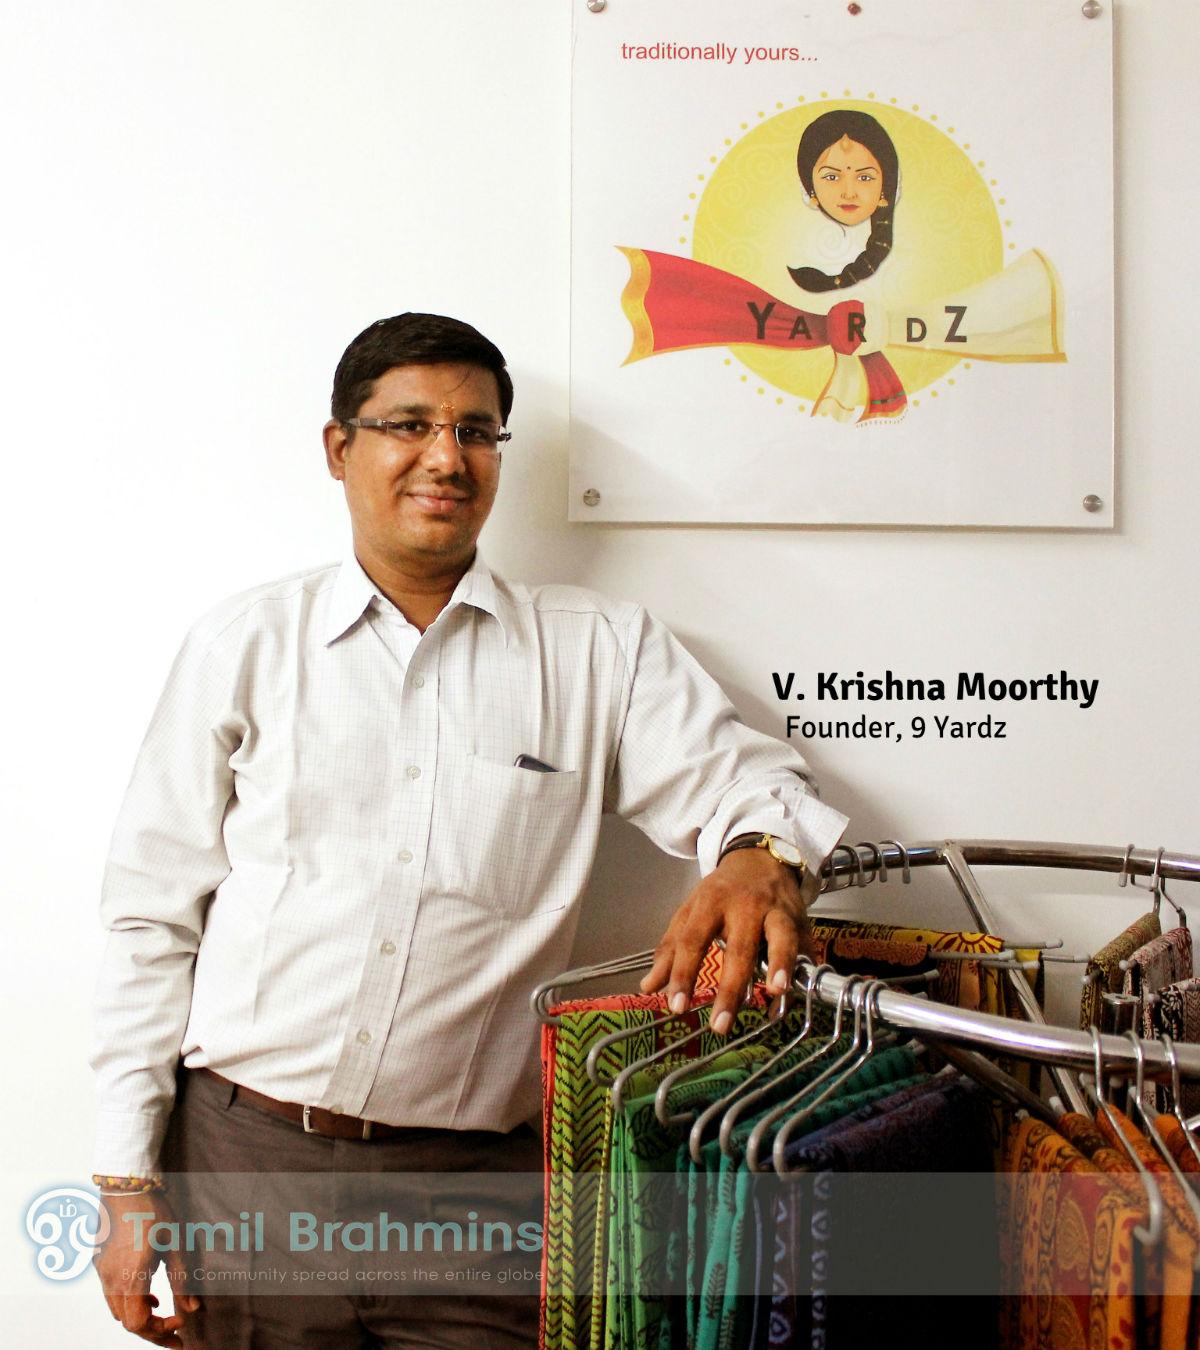 krishnamoorthy-jpg.7057 9 Yardz - Let's go the Madisar Style